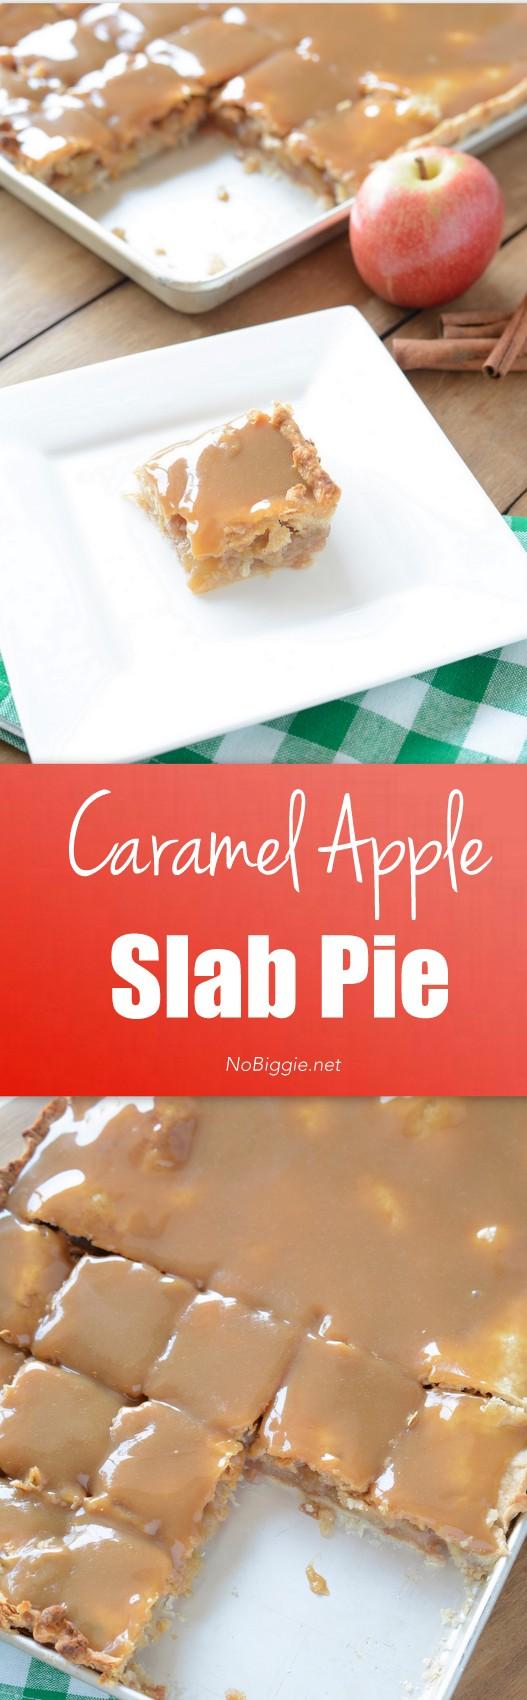 Caramel Apple Slab Pie this recipe is amazing! Get it on NoBiggie.net